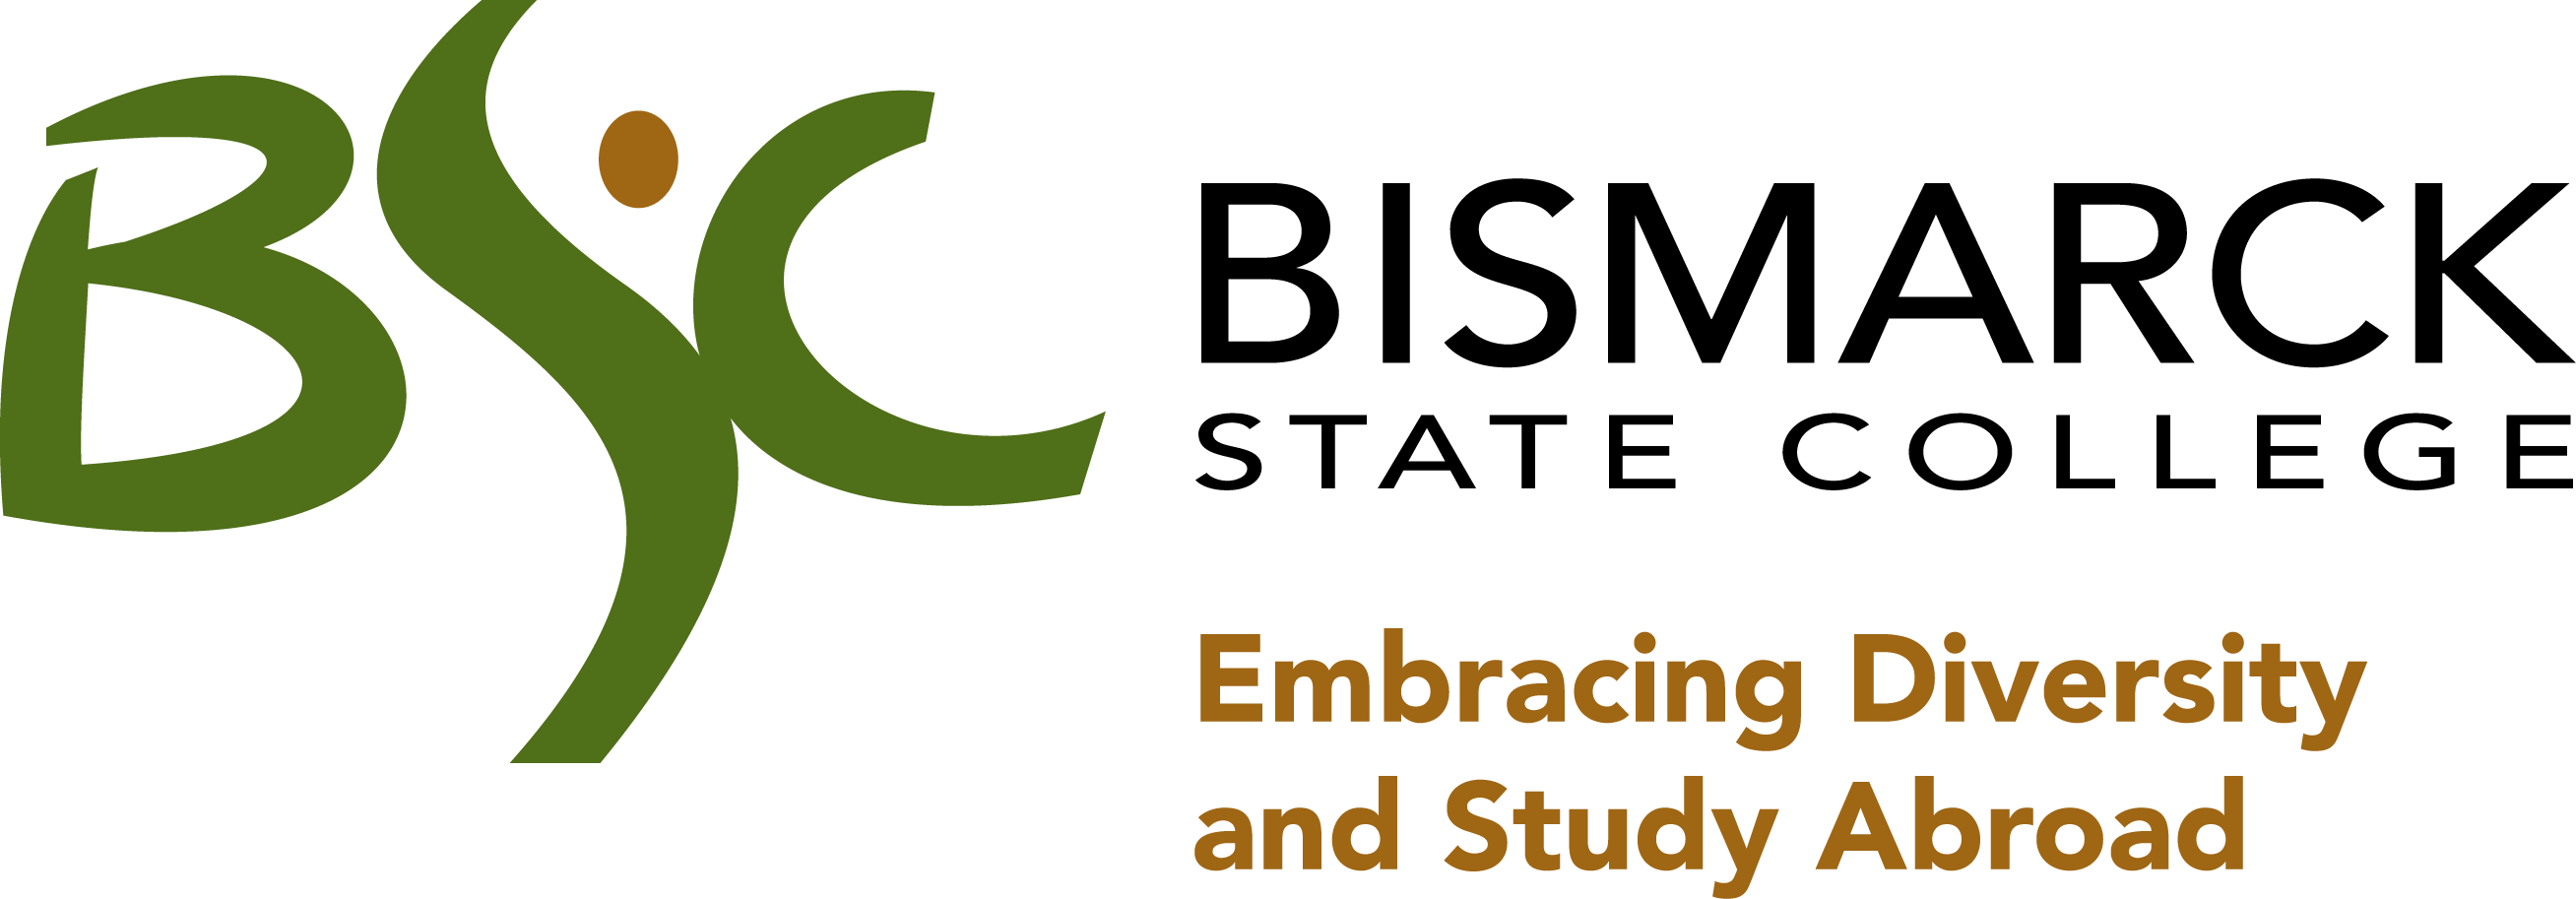 Bismarck State College – Embracing Diversity Committee